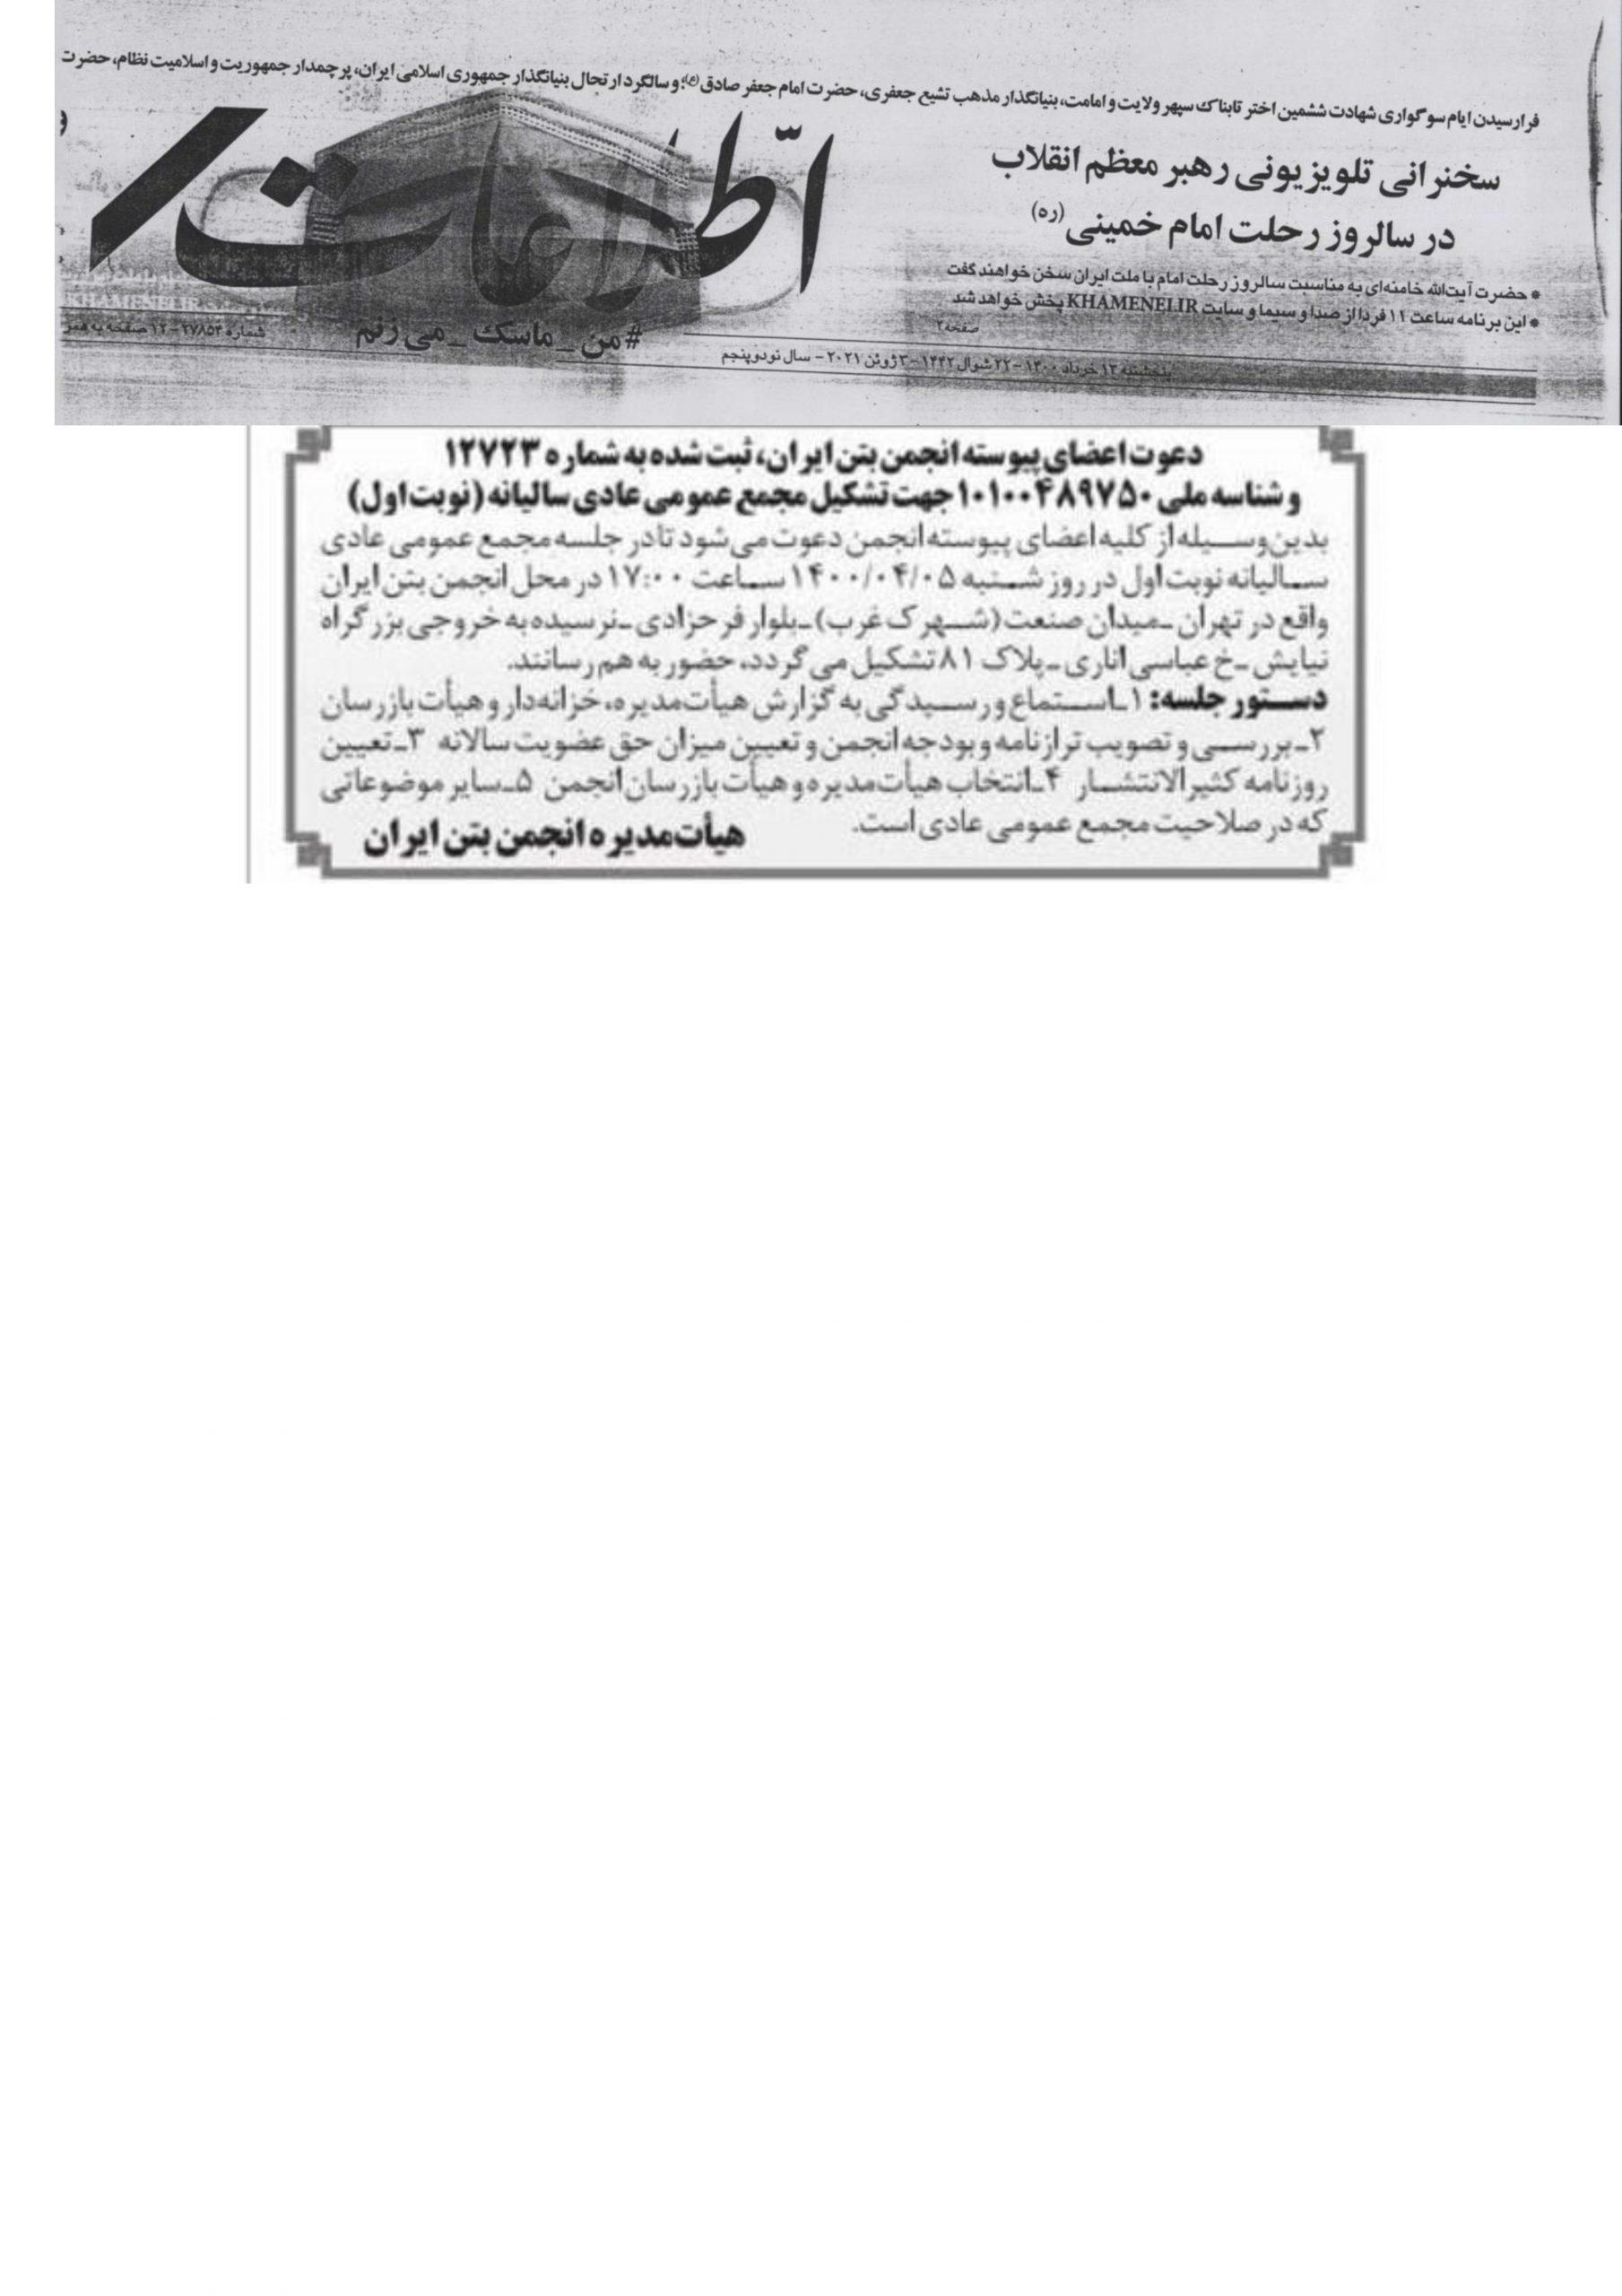 مجمع نوبت اول انجمن بتن ایران